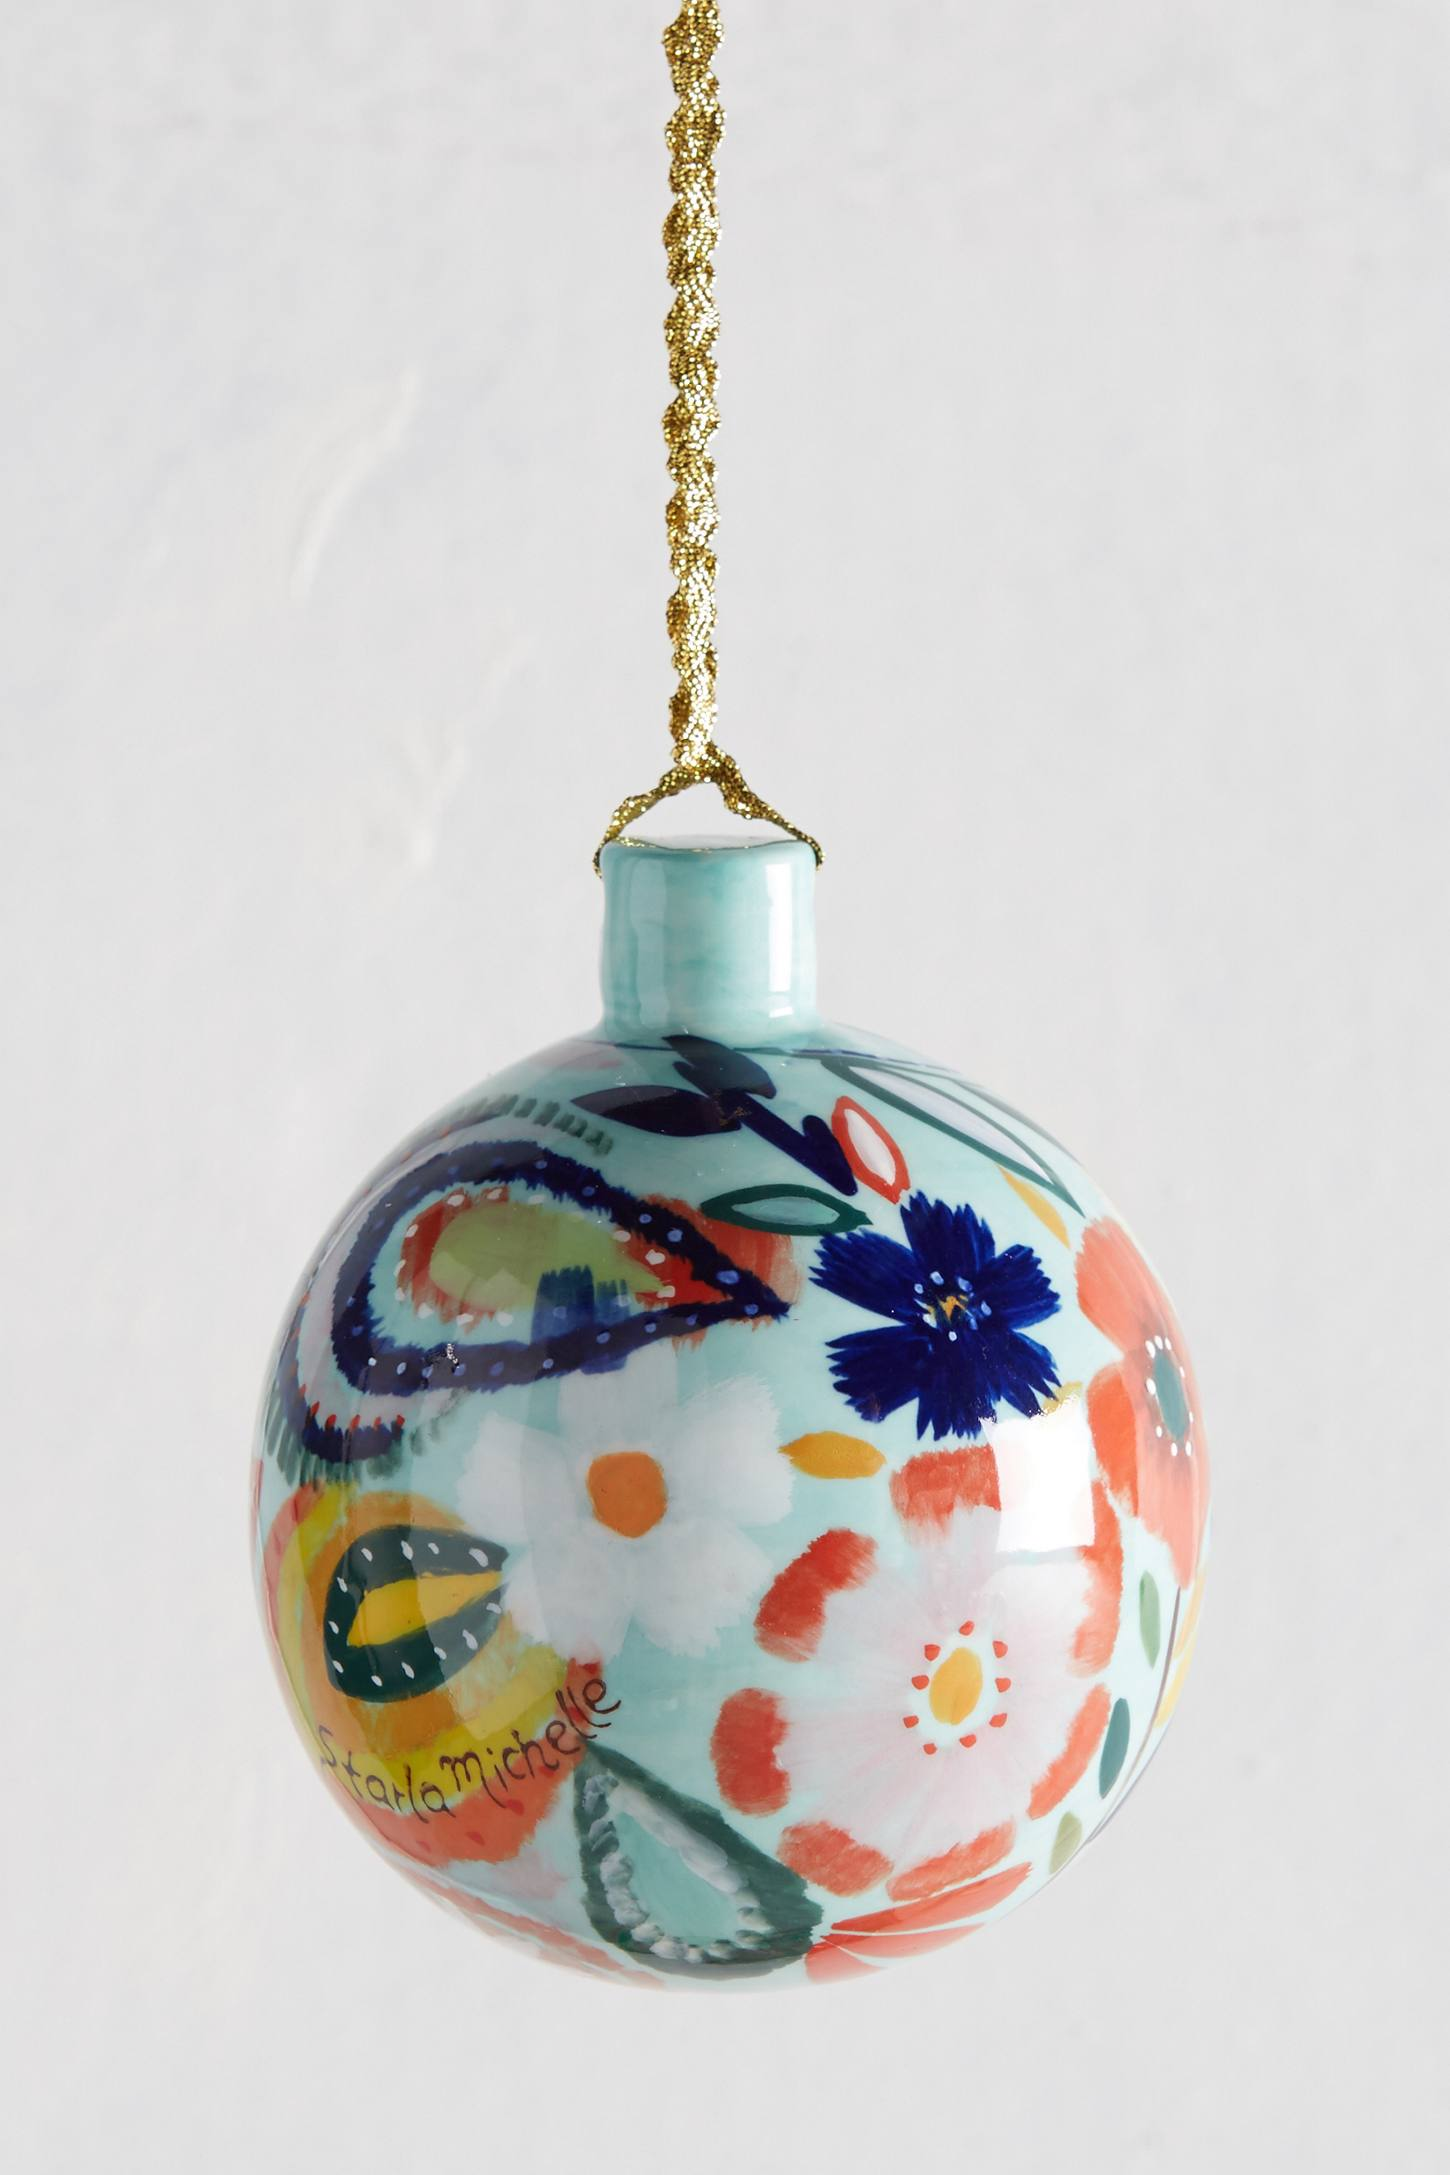 Mooreland Ornament